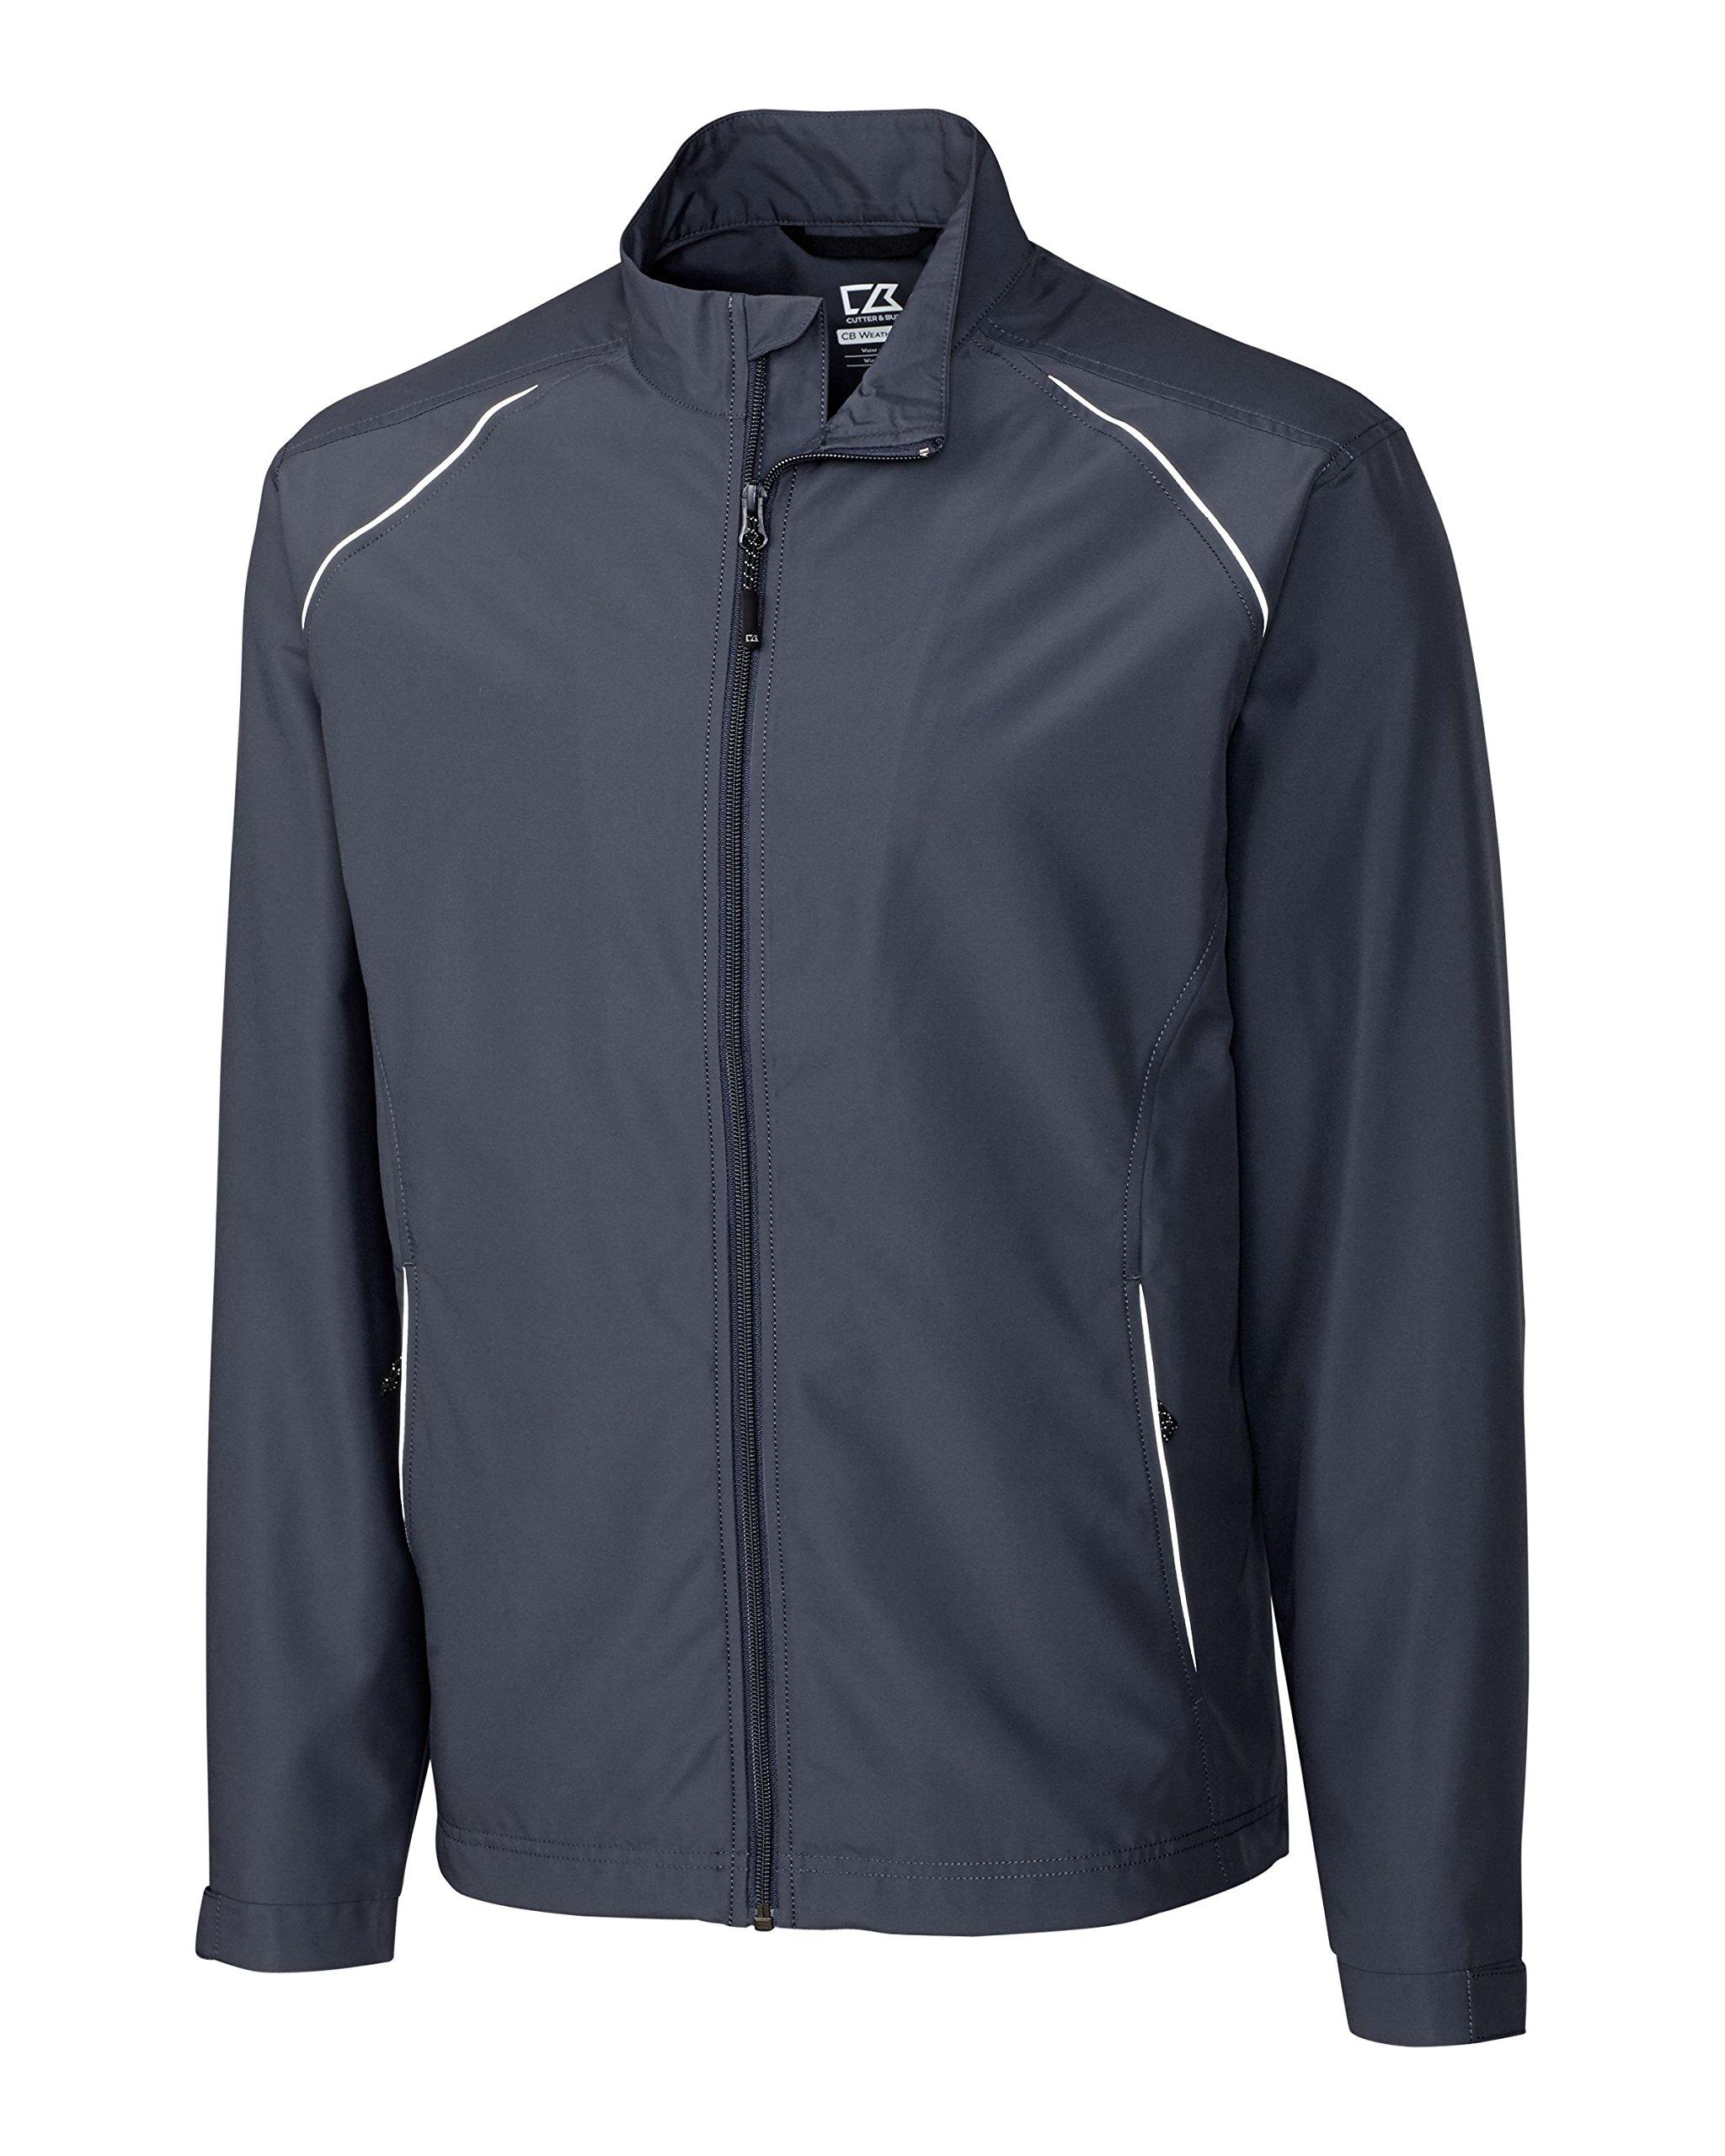 Cutter & Buck BCO00923 Men's CB Weathertec Beacon Full Zip Jacket Onyx LT